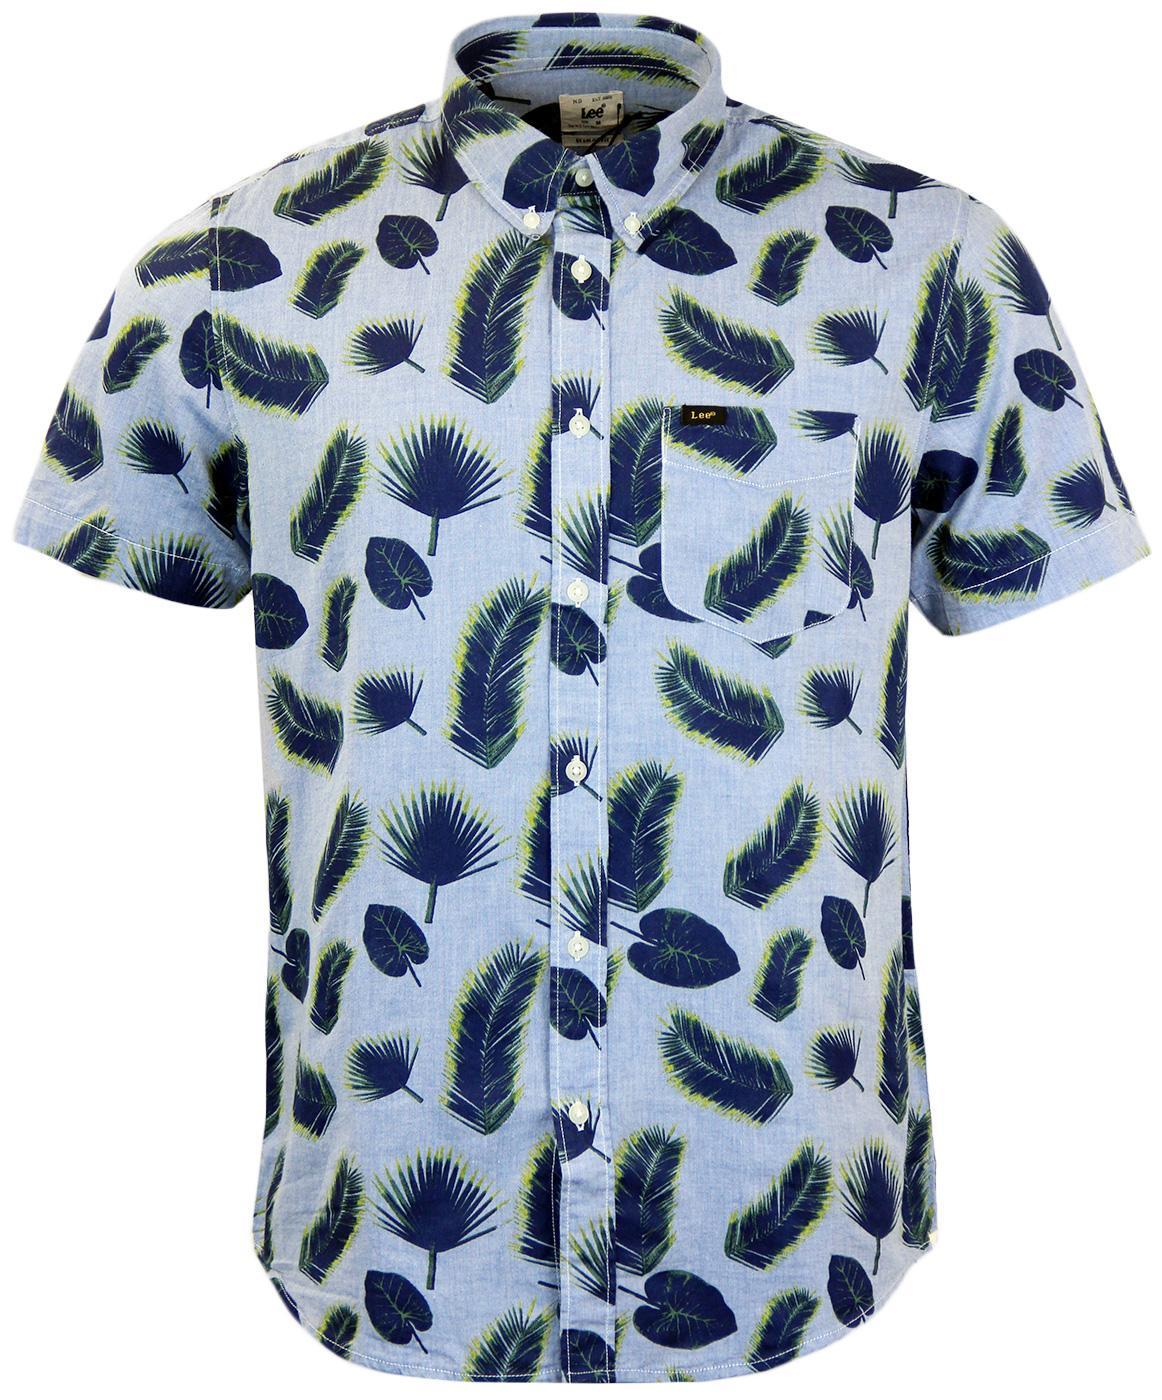 LEE Retro Mod Button Down Feather Print Shirt